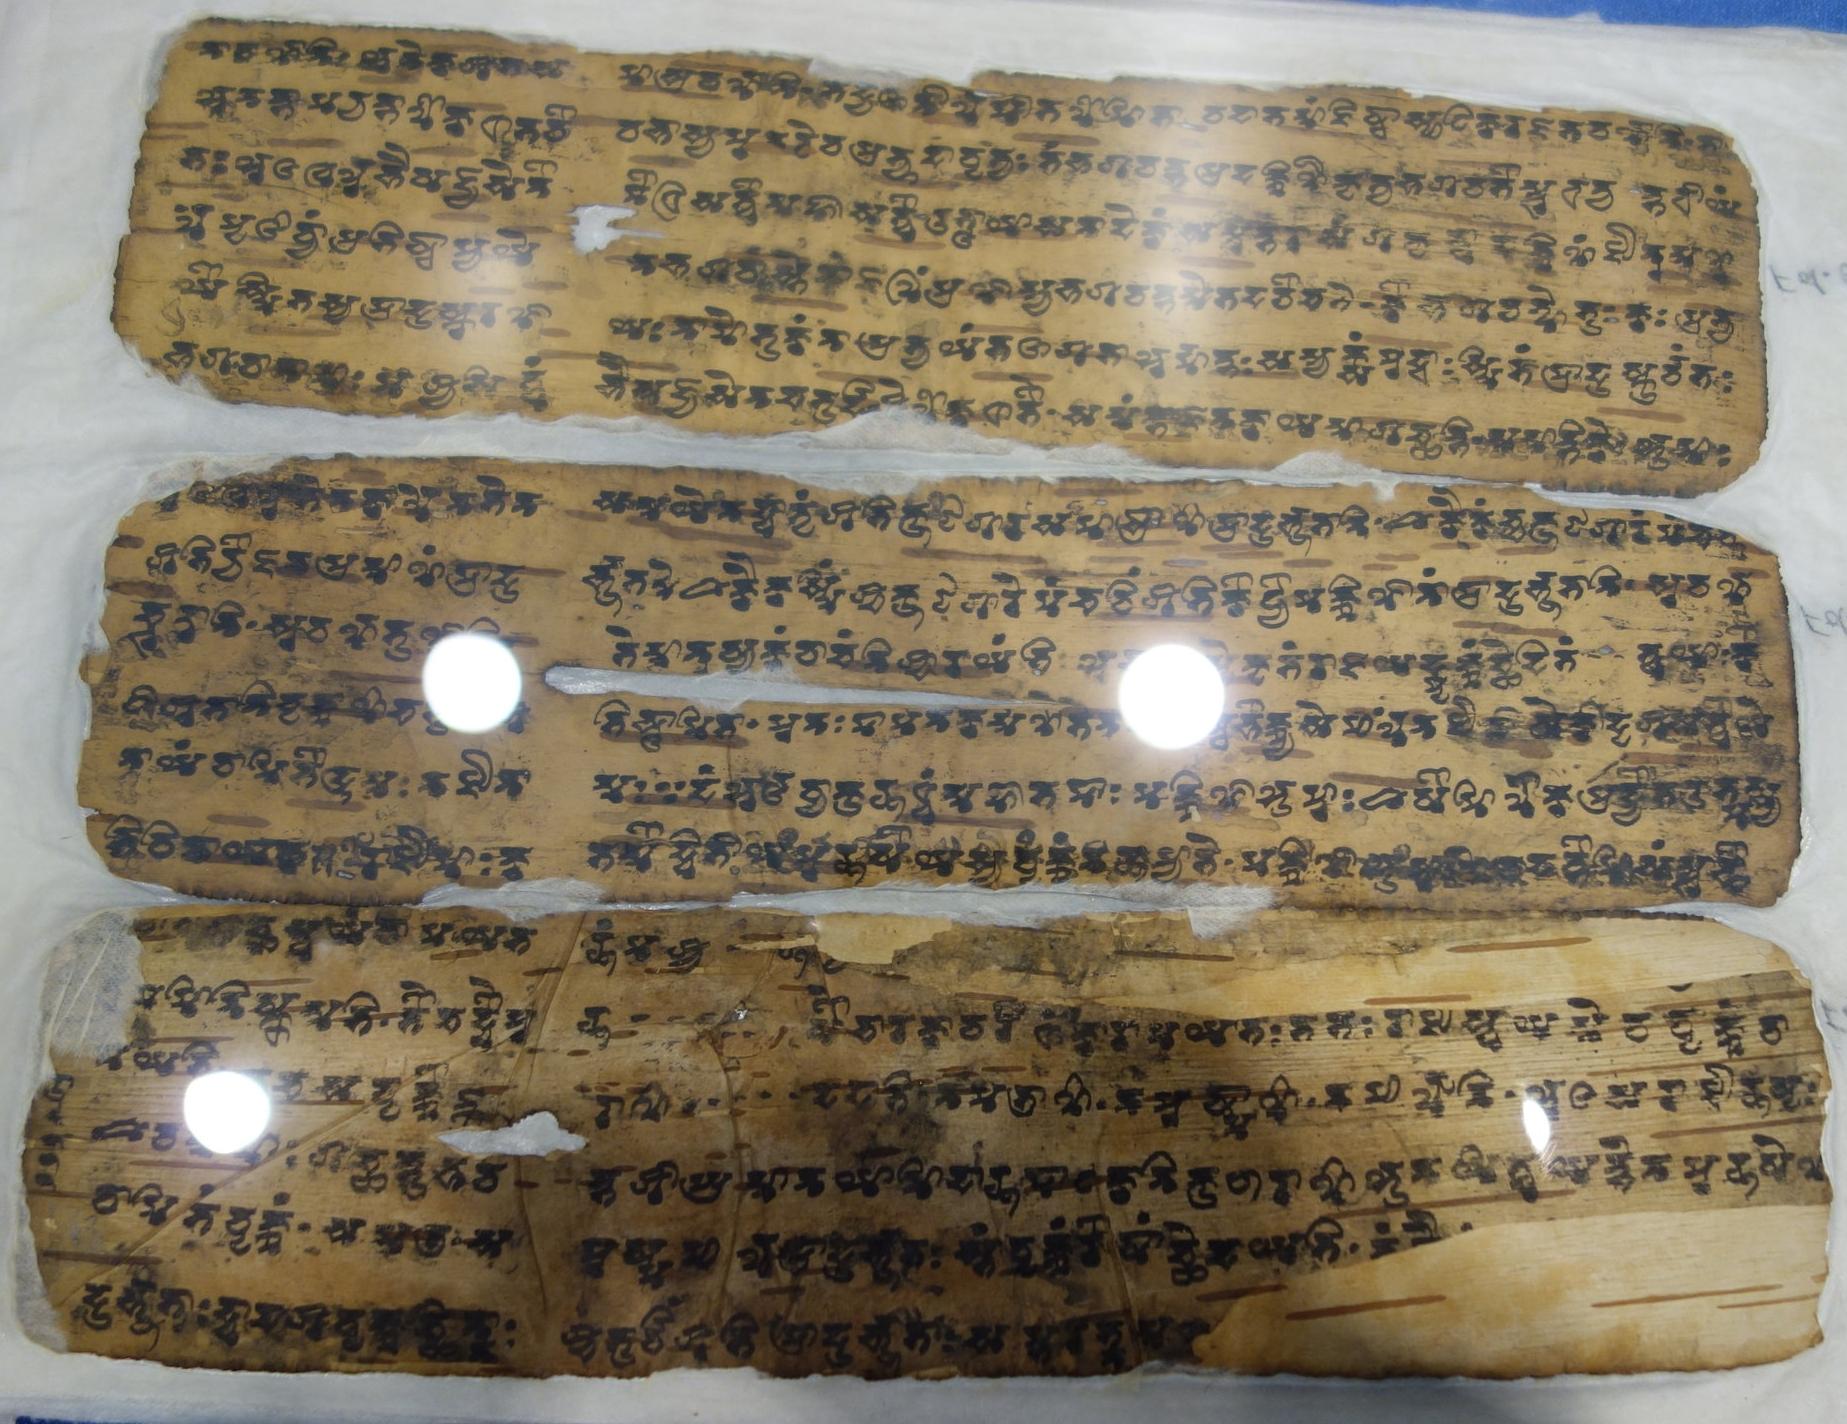 More leaves from the Gilgit Manuscript